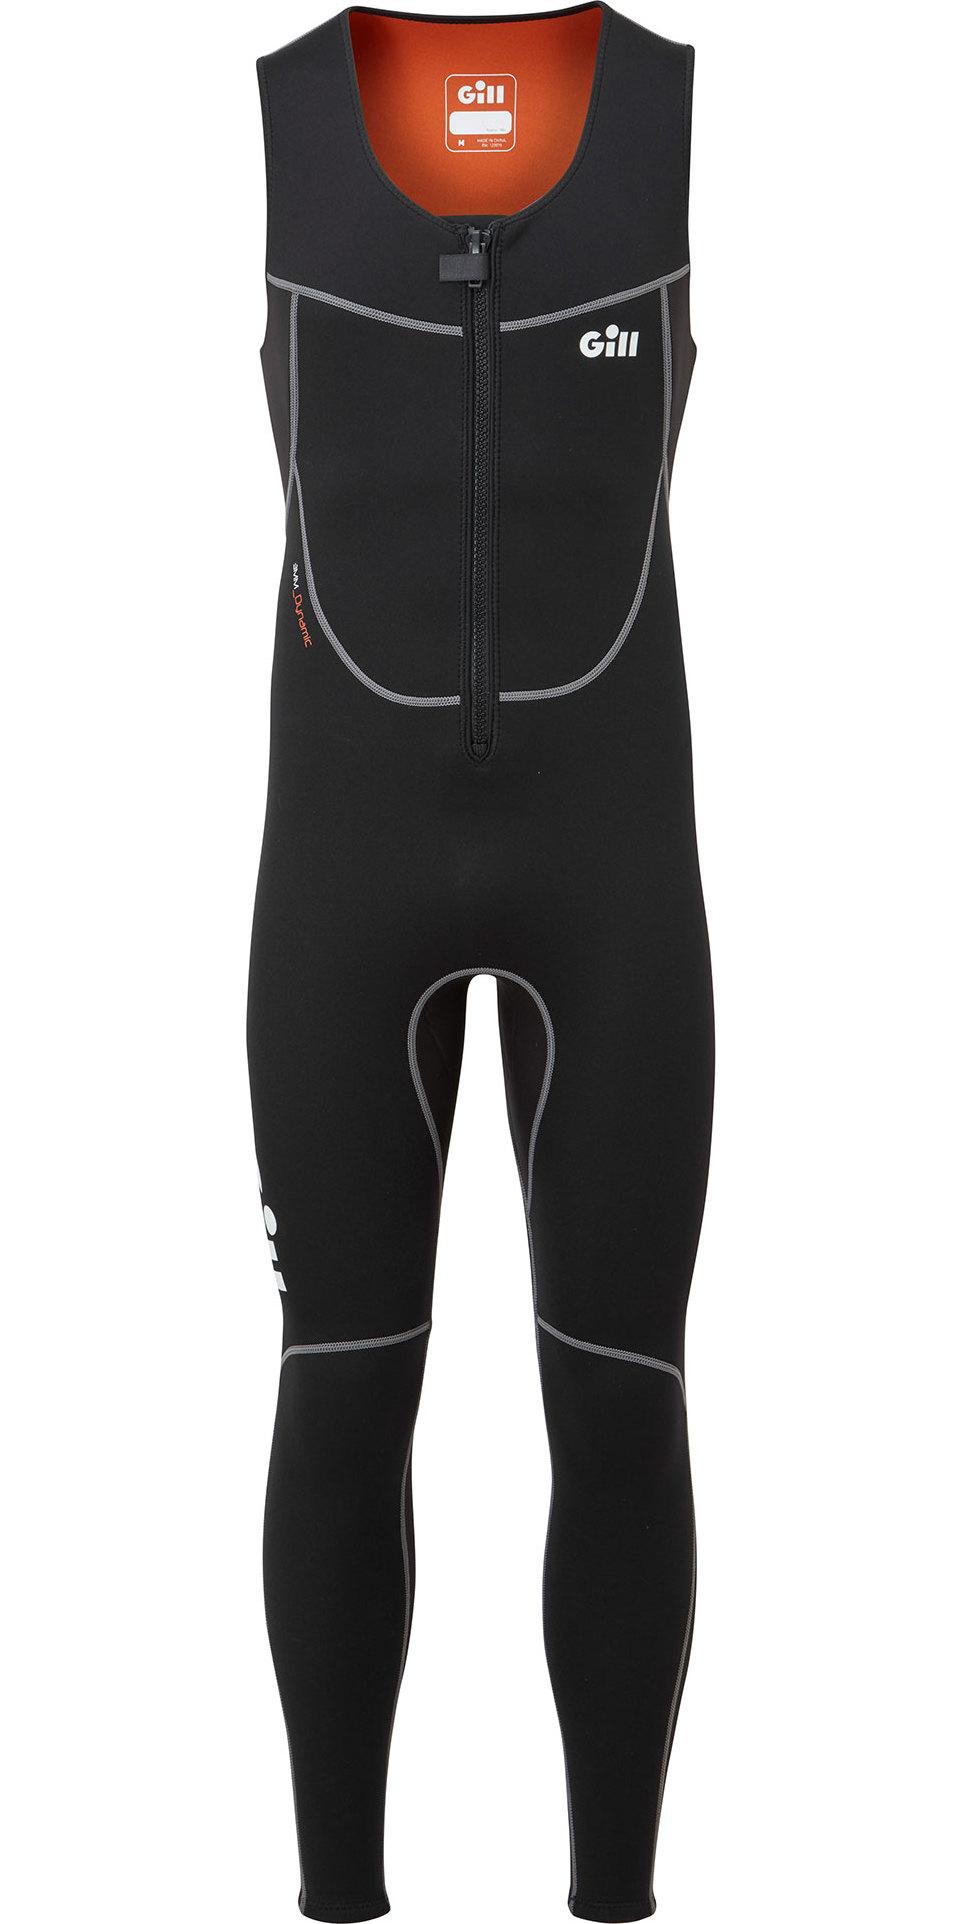 2020 Gill Junior Dynamic 3mm Long John Wetsuit 5017j - Sort